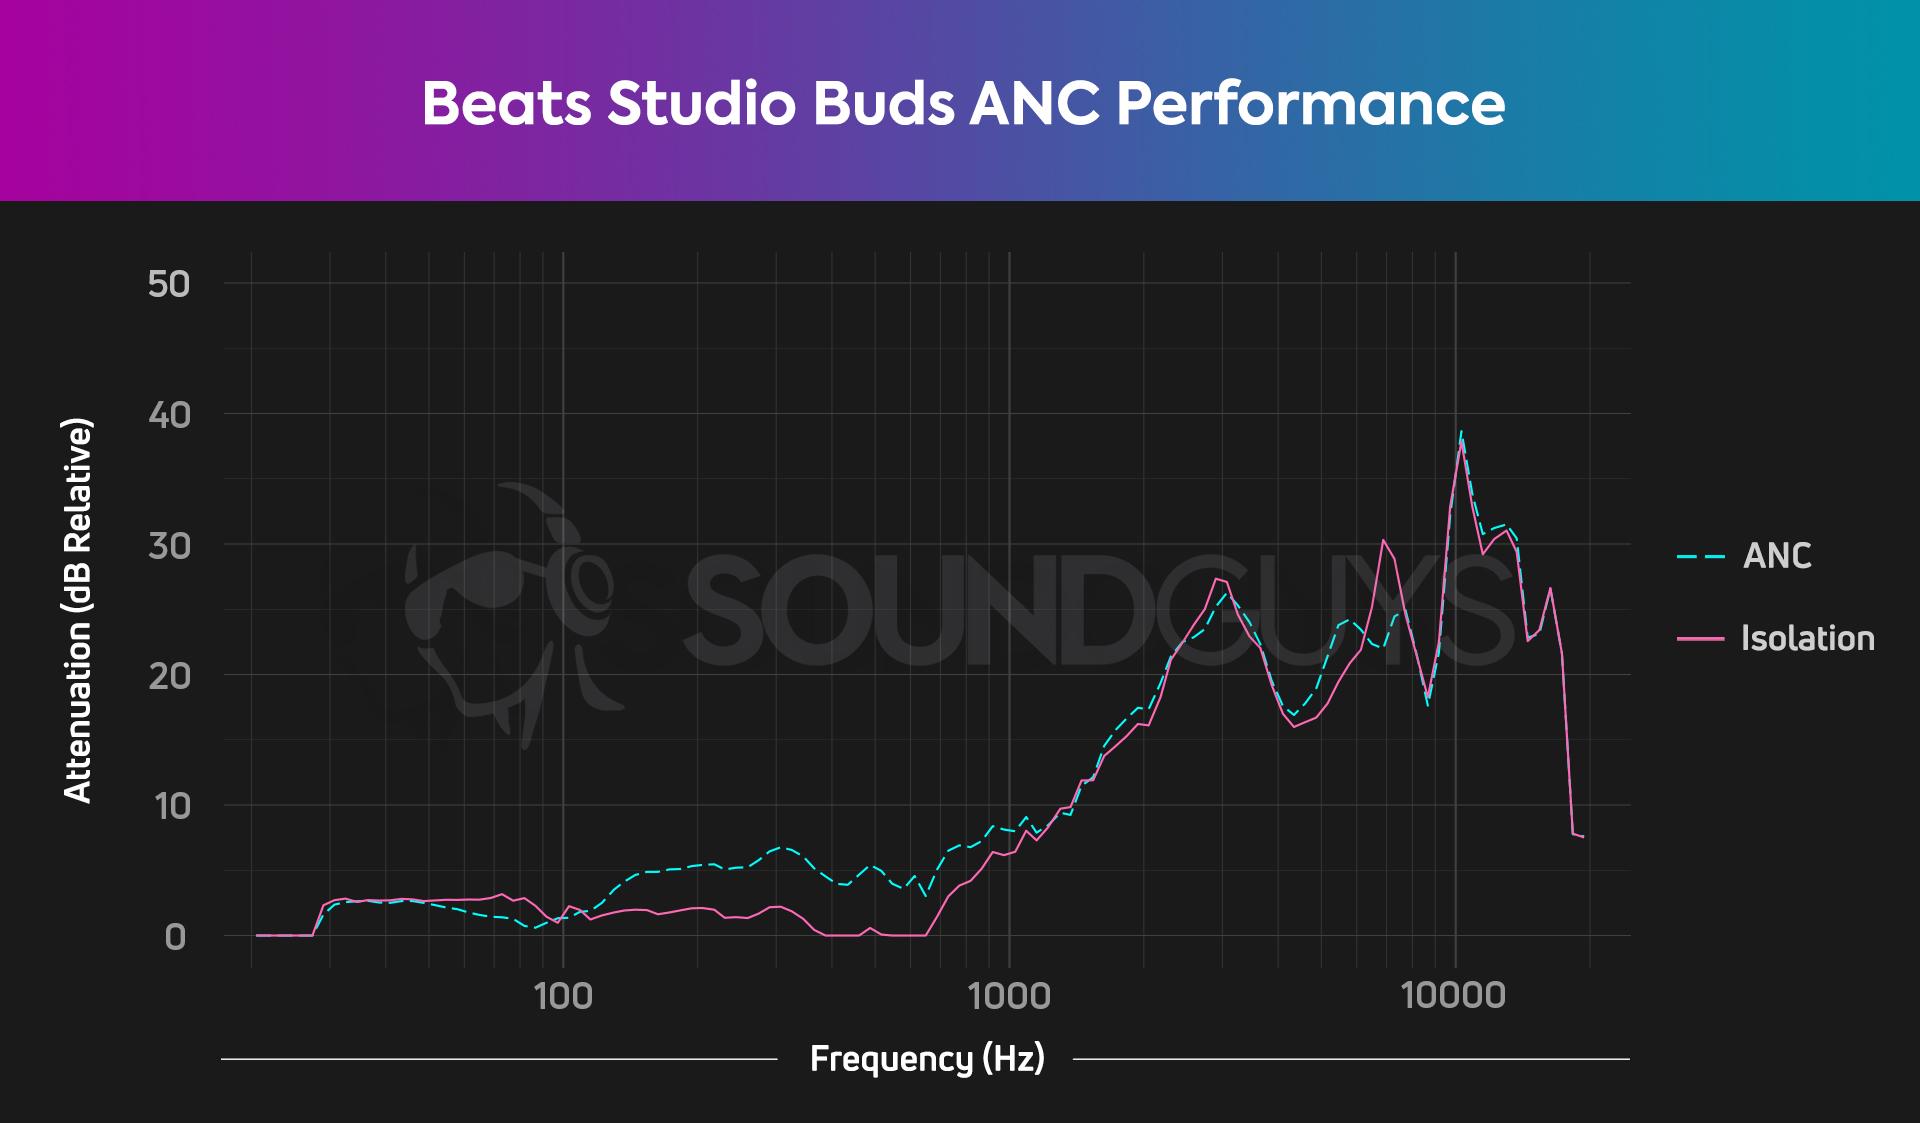 Beats Studio Buds ANC chart